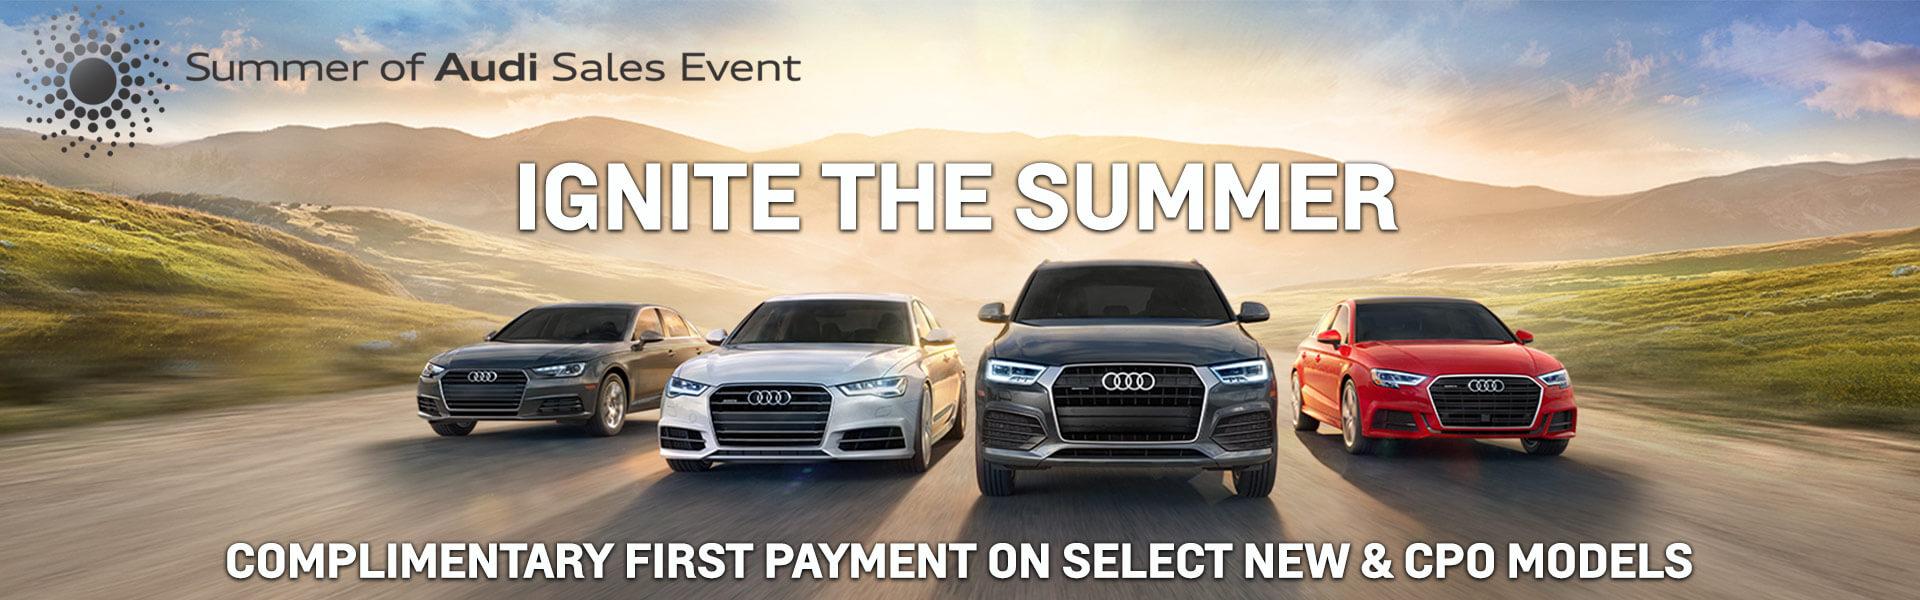 Summer of Audi